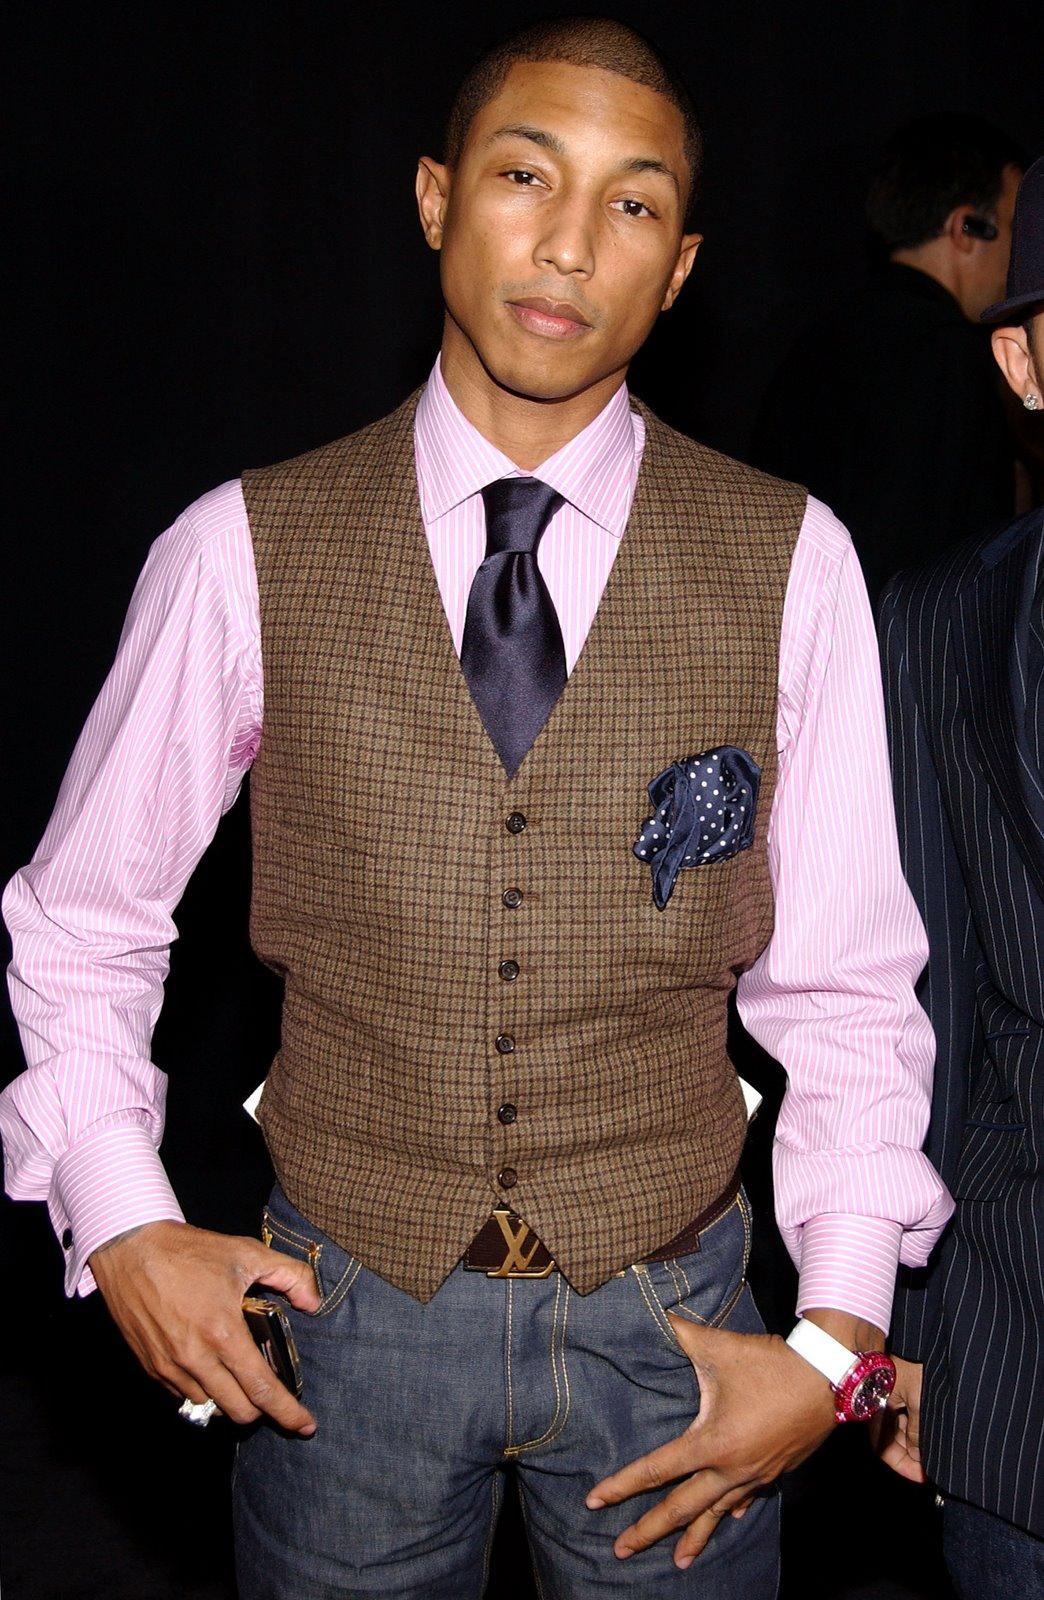 Pharrell Williams Louis Vuitton Party Look